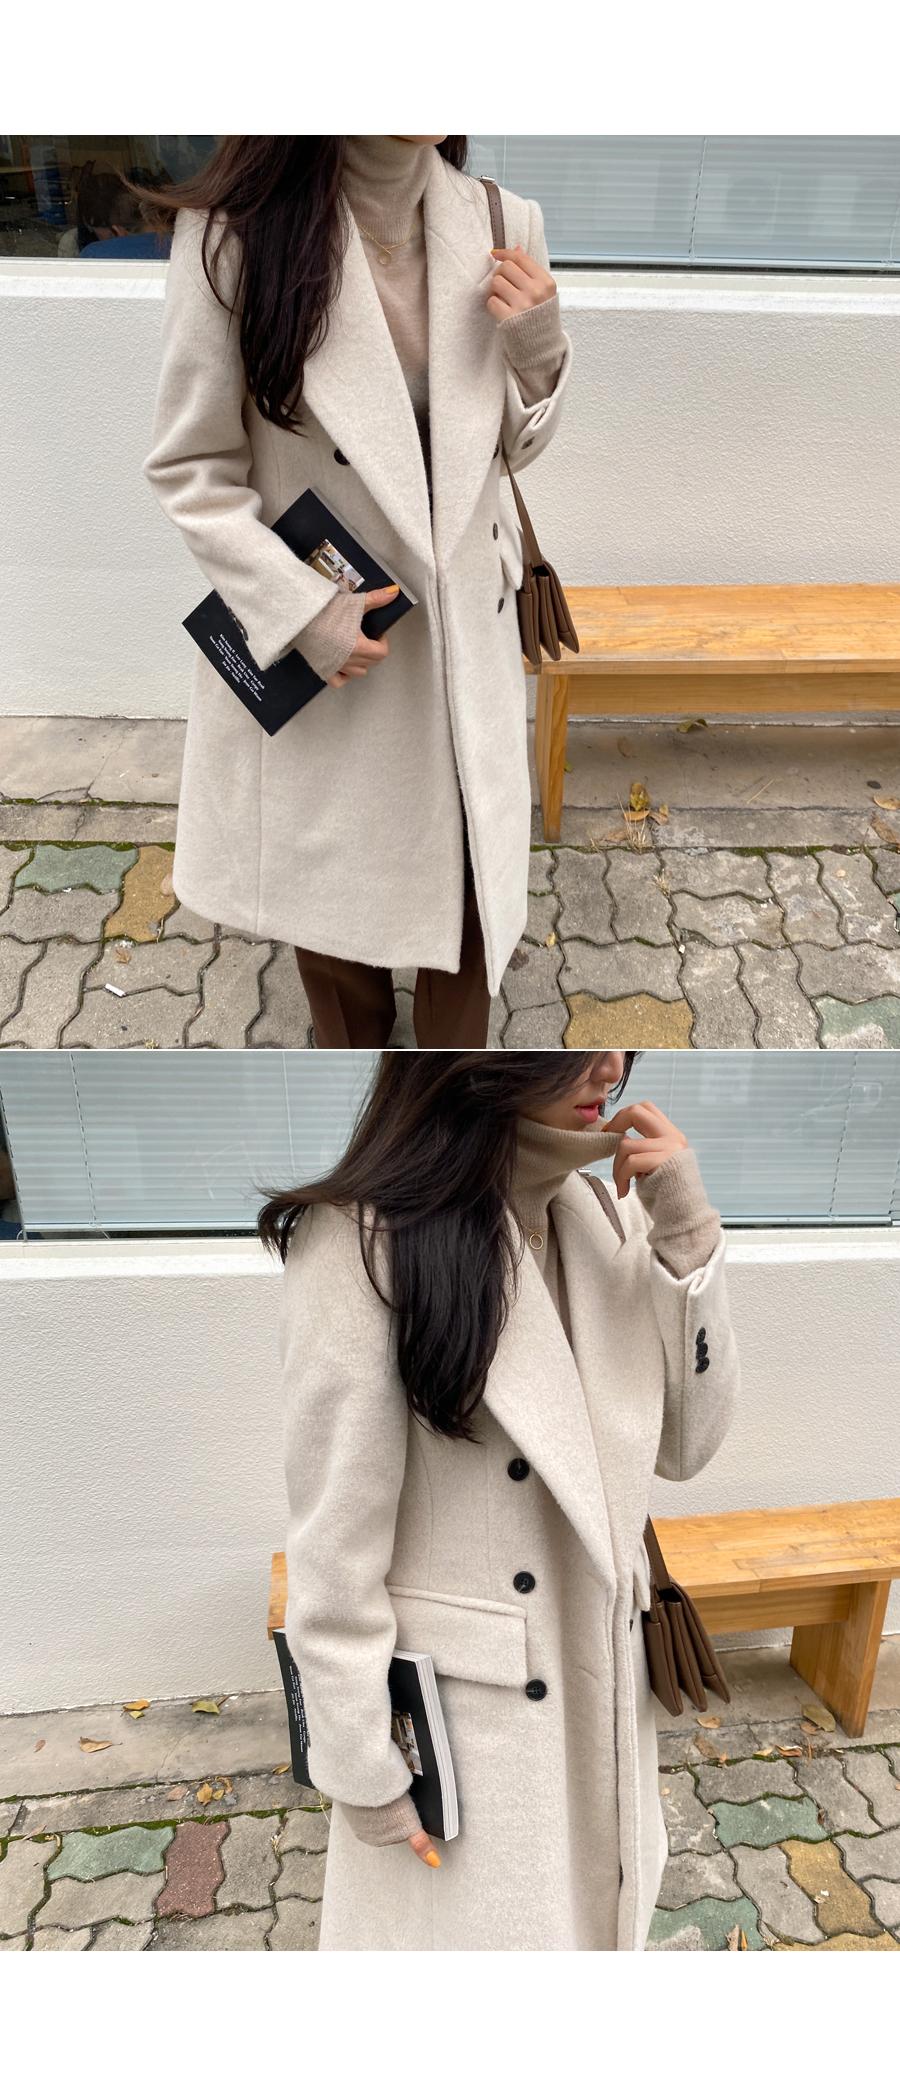 Porine coat